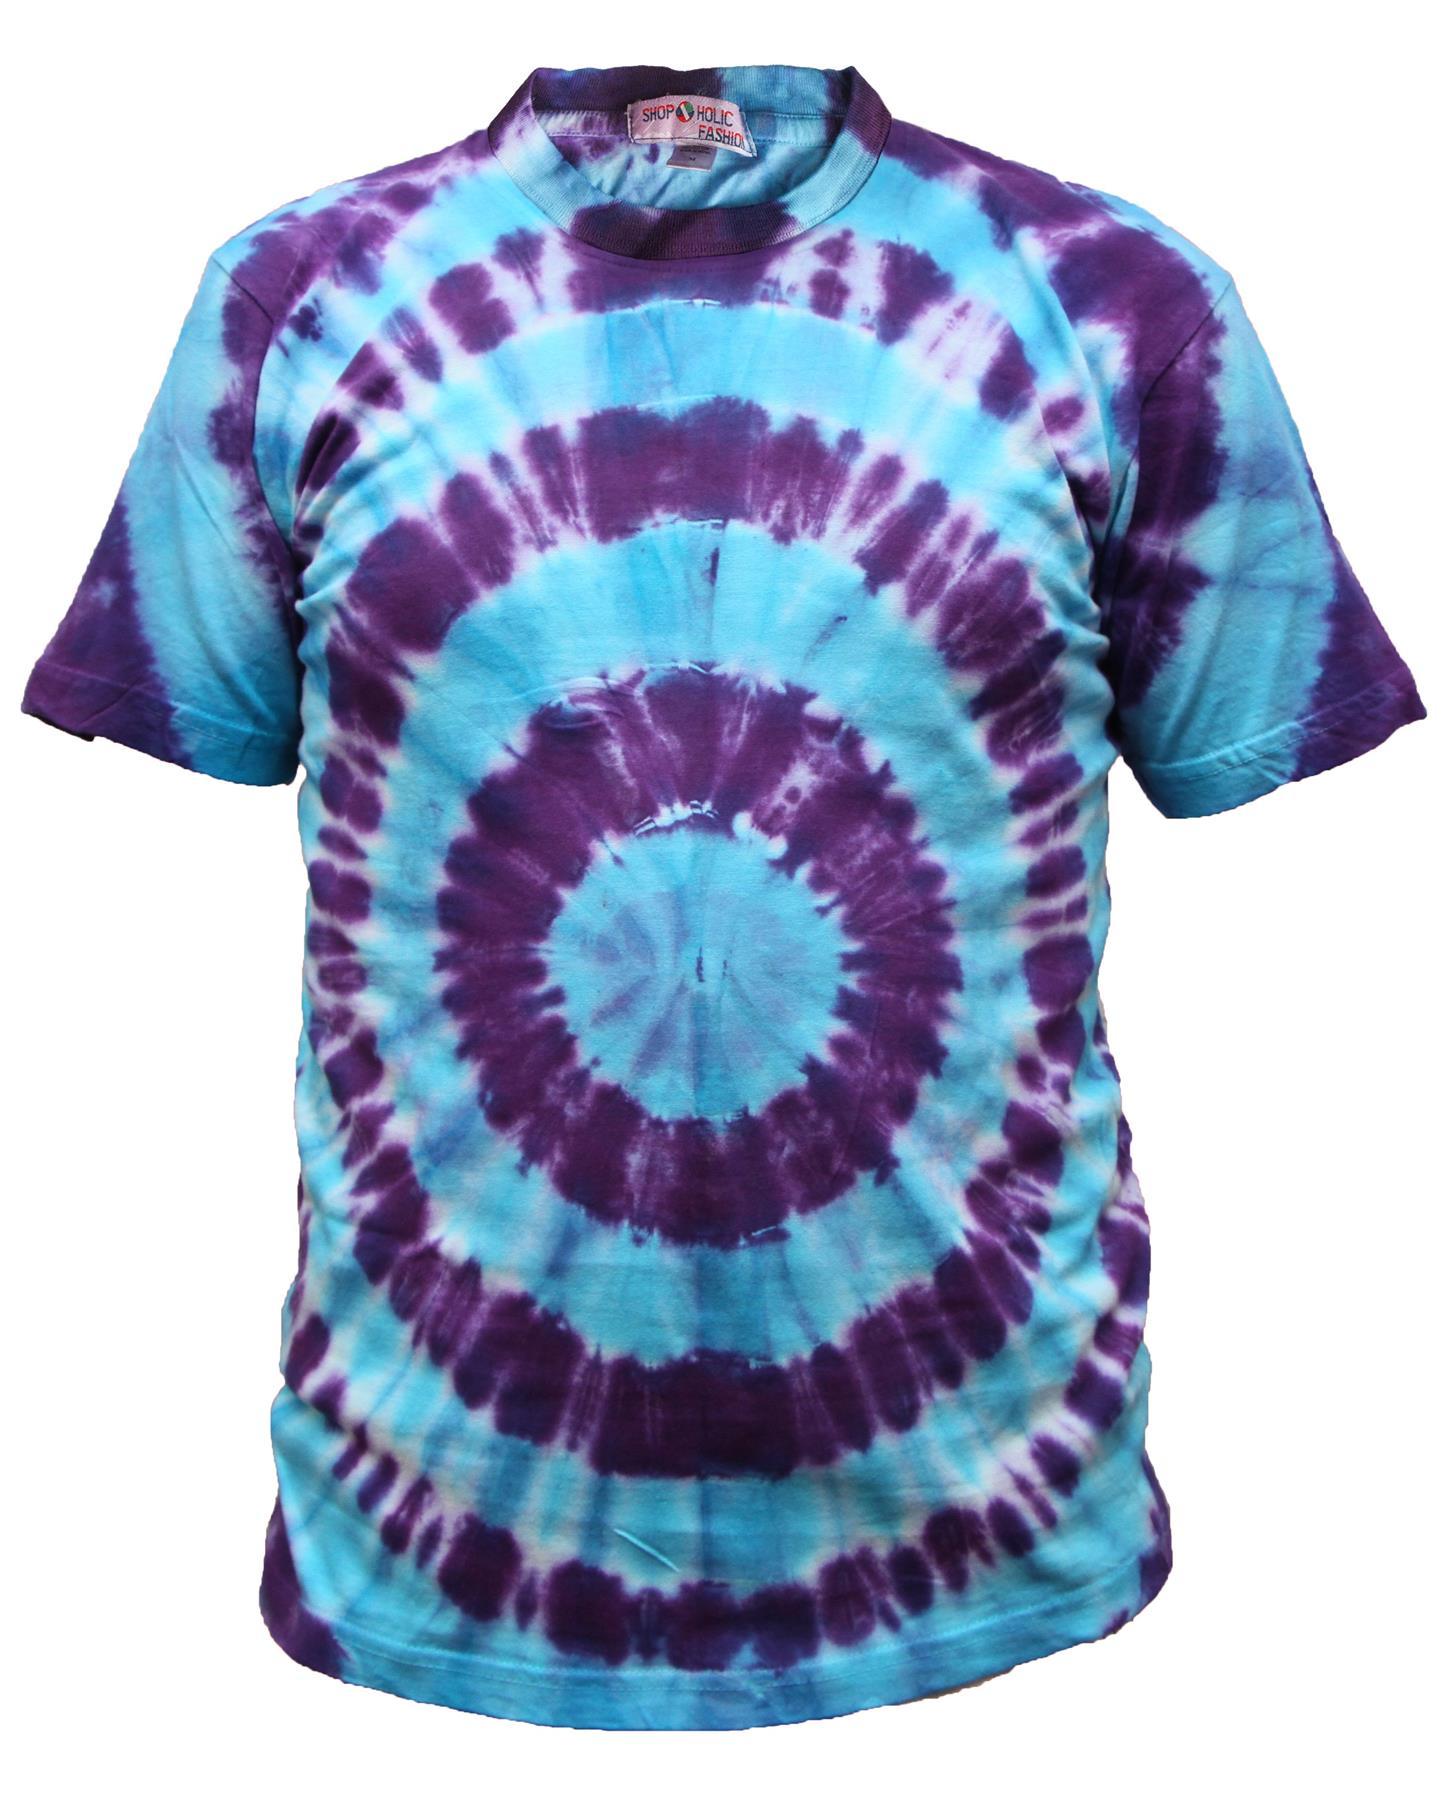 Tie-Dye-T-Shirt-Music-Festival-Tye-Dye-Tee-Hipster-Retro-Unisex-Short-Sleeve-Top thumbnail 15